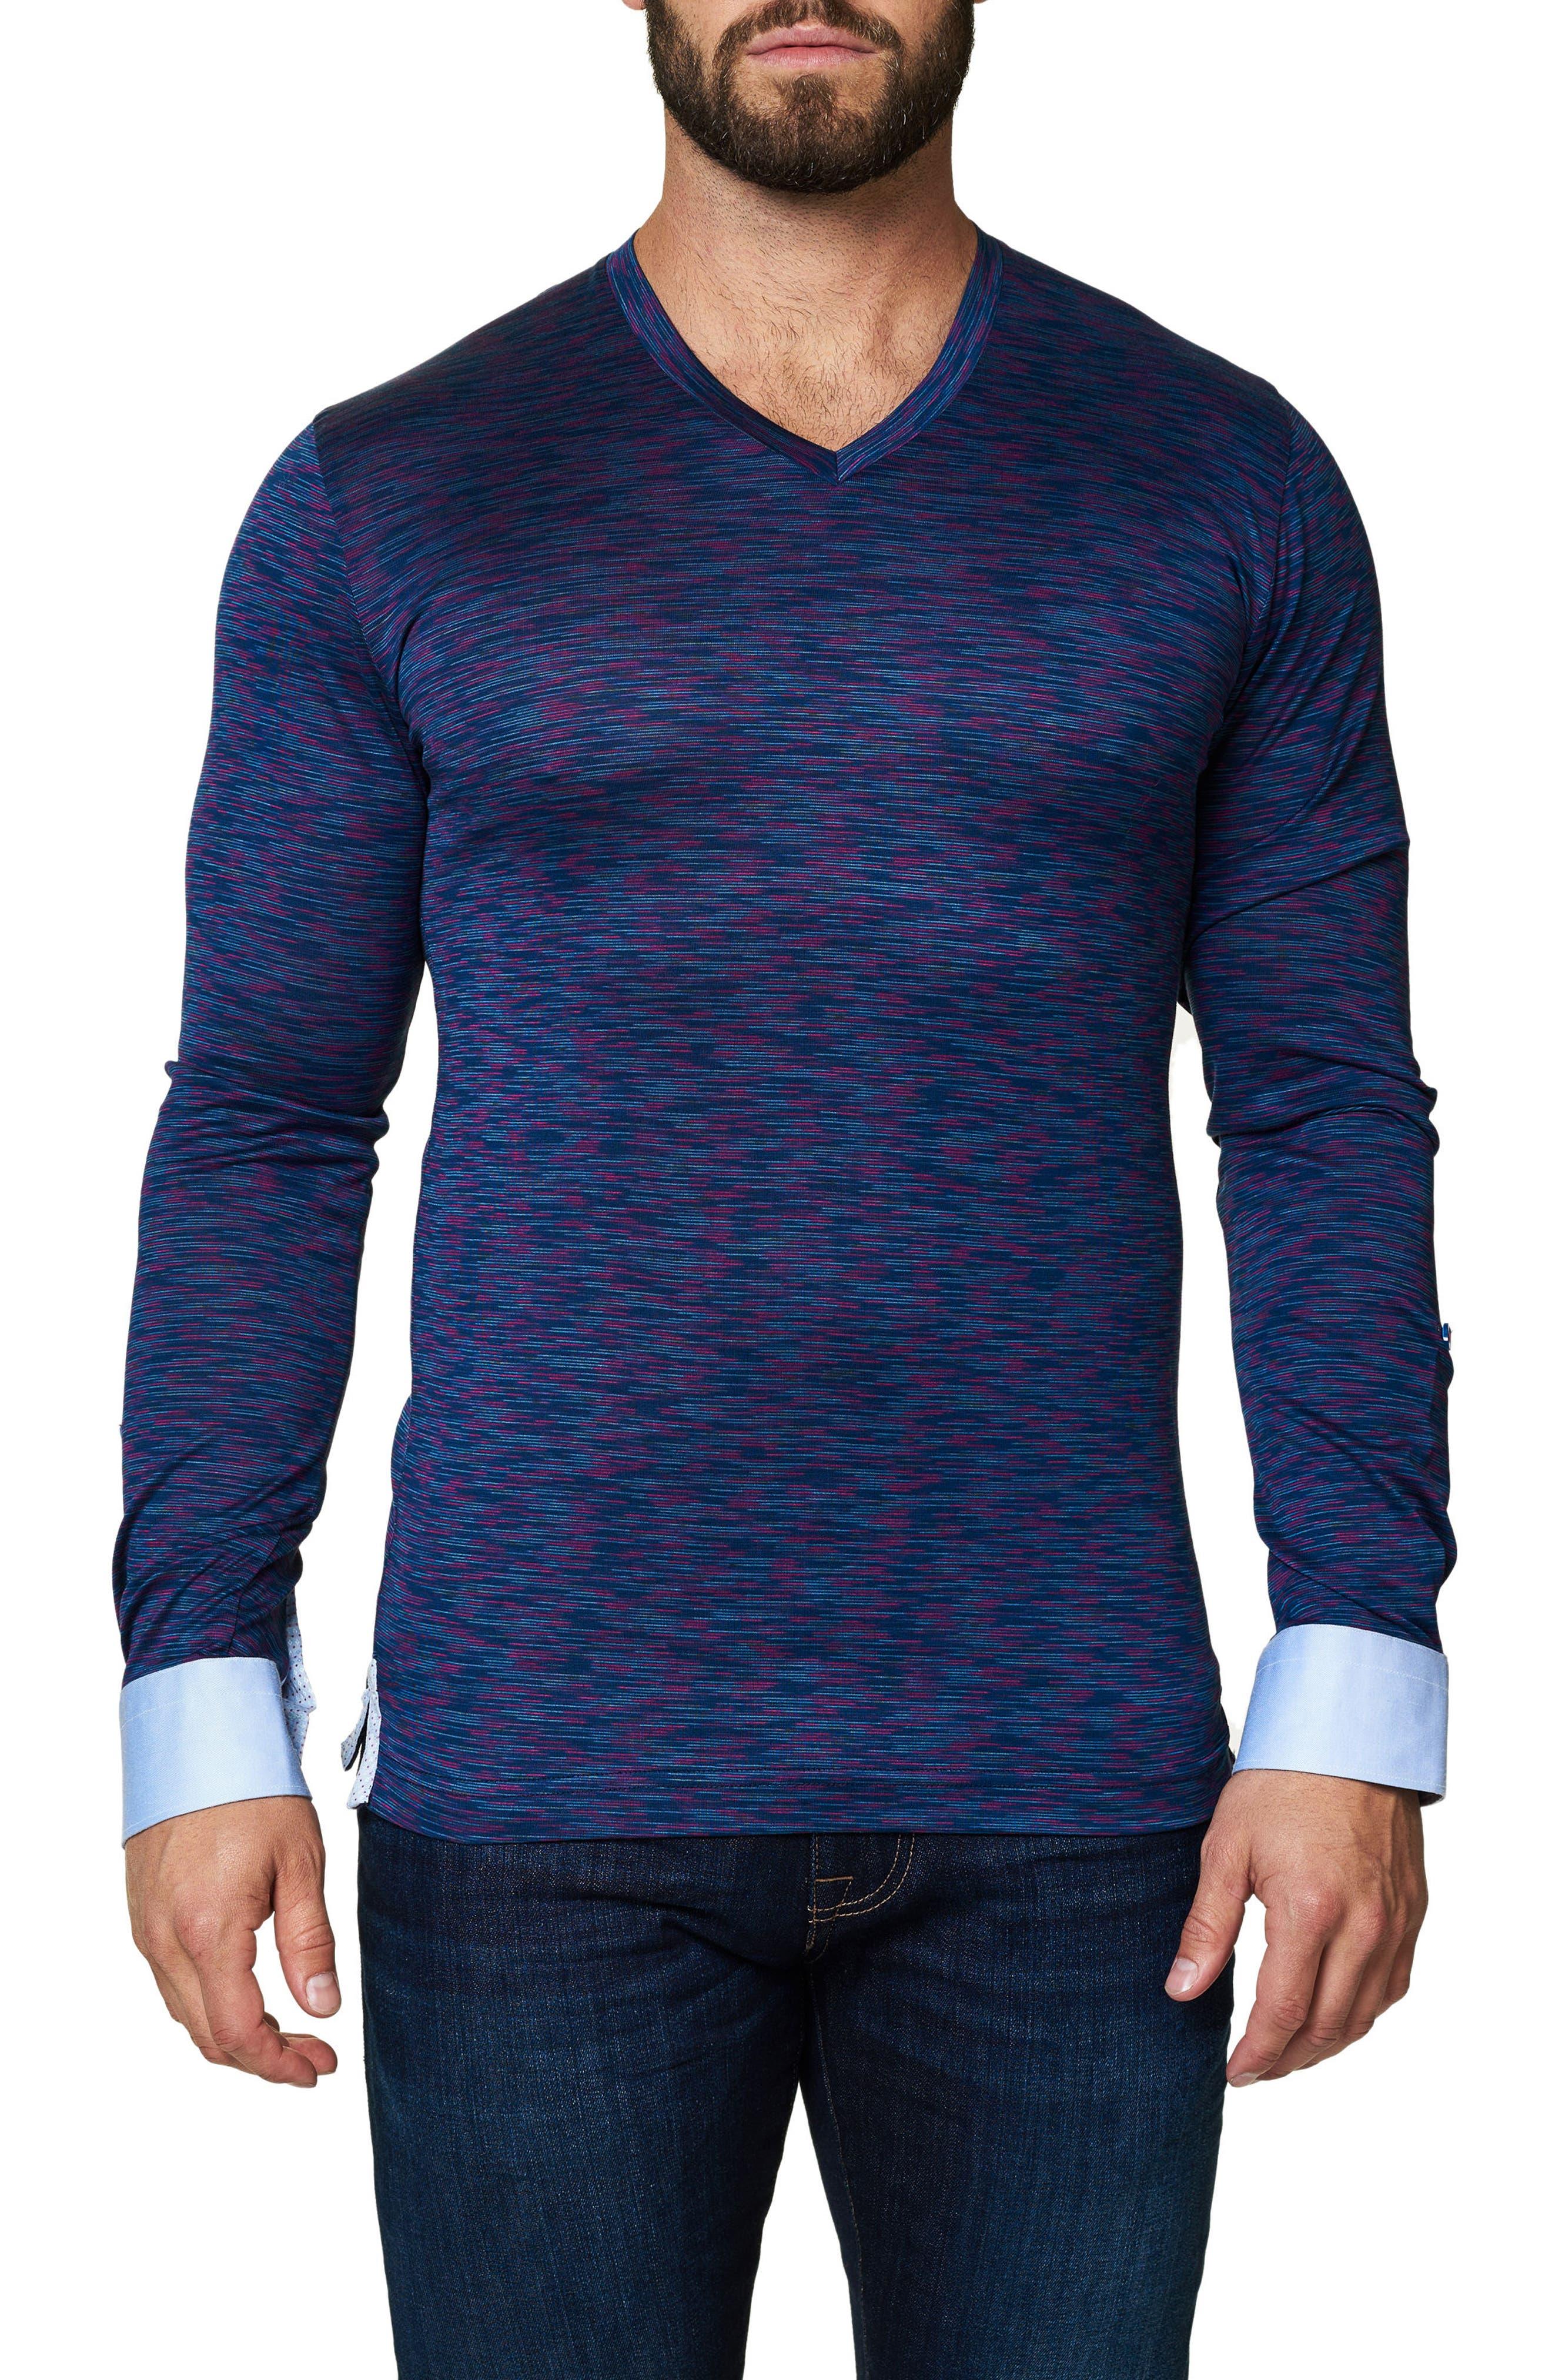 Alternate Image 1 Selected - Maceoo Print V-Neck T-Shirt